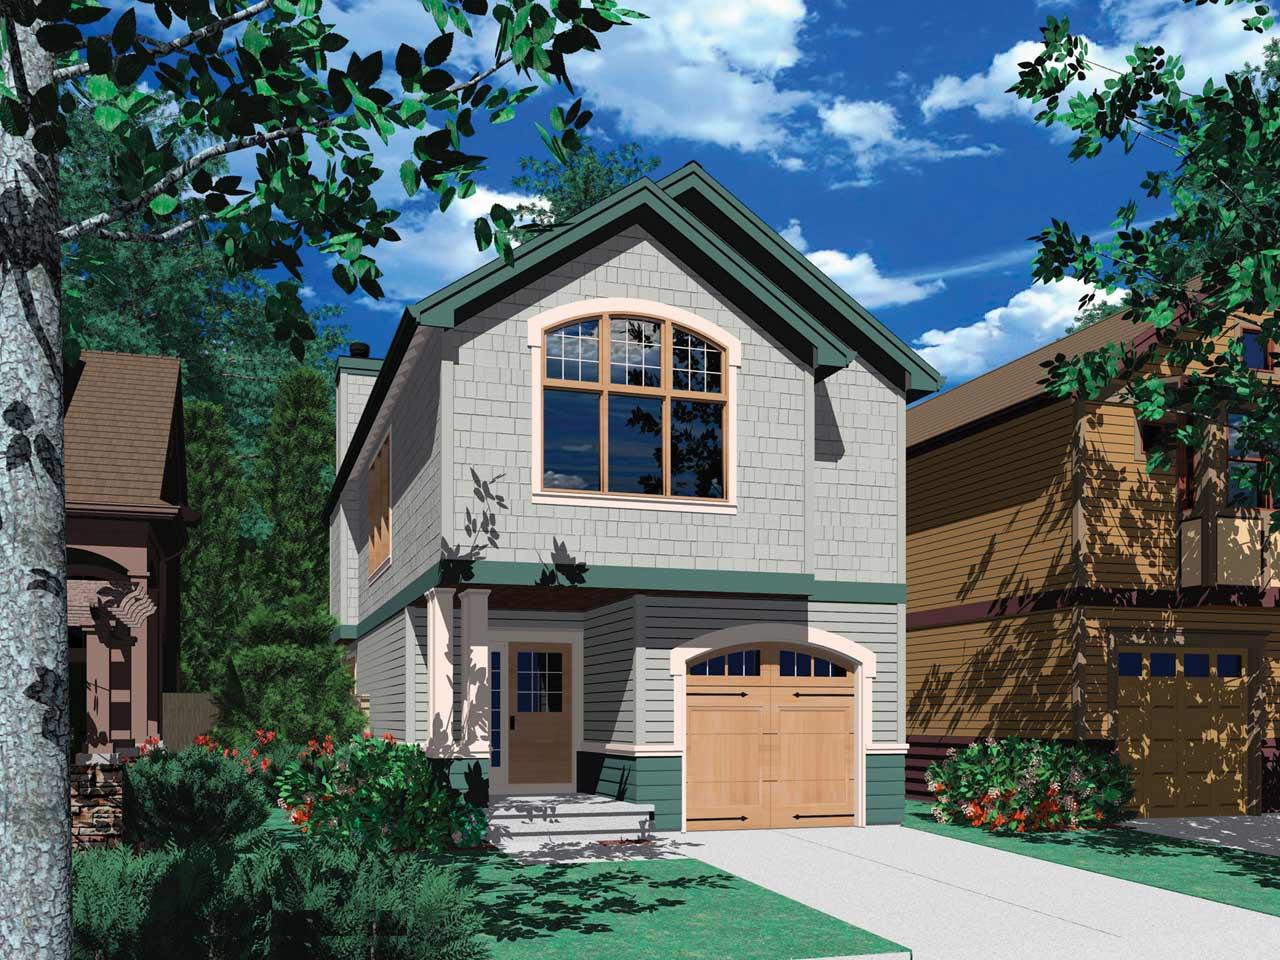 Craftsman Style Home Design Plan: 74-283